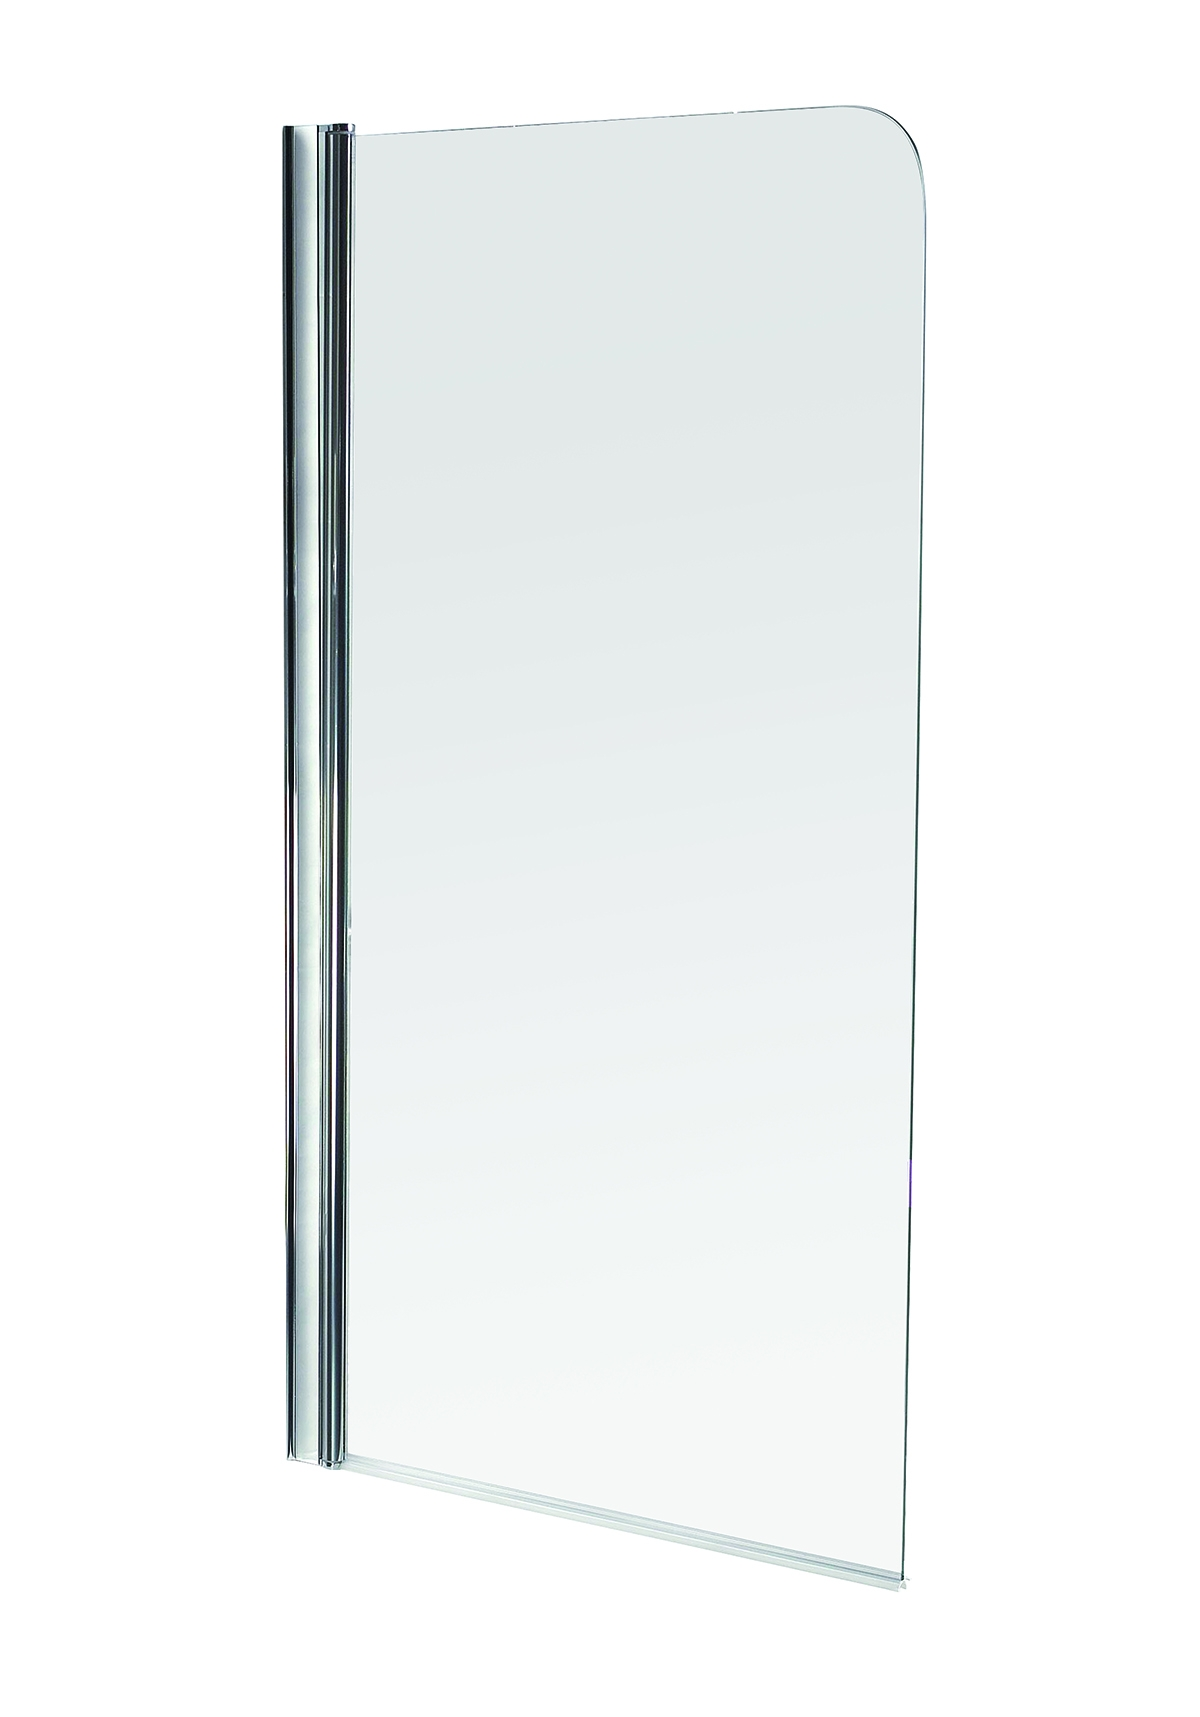 Aqualux Shine Badwand recht 150x85cm anti-kalk